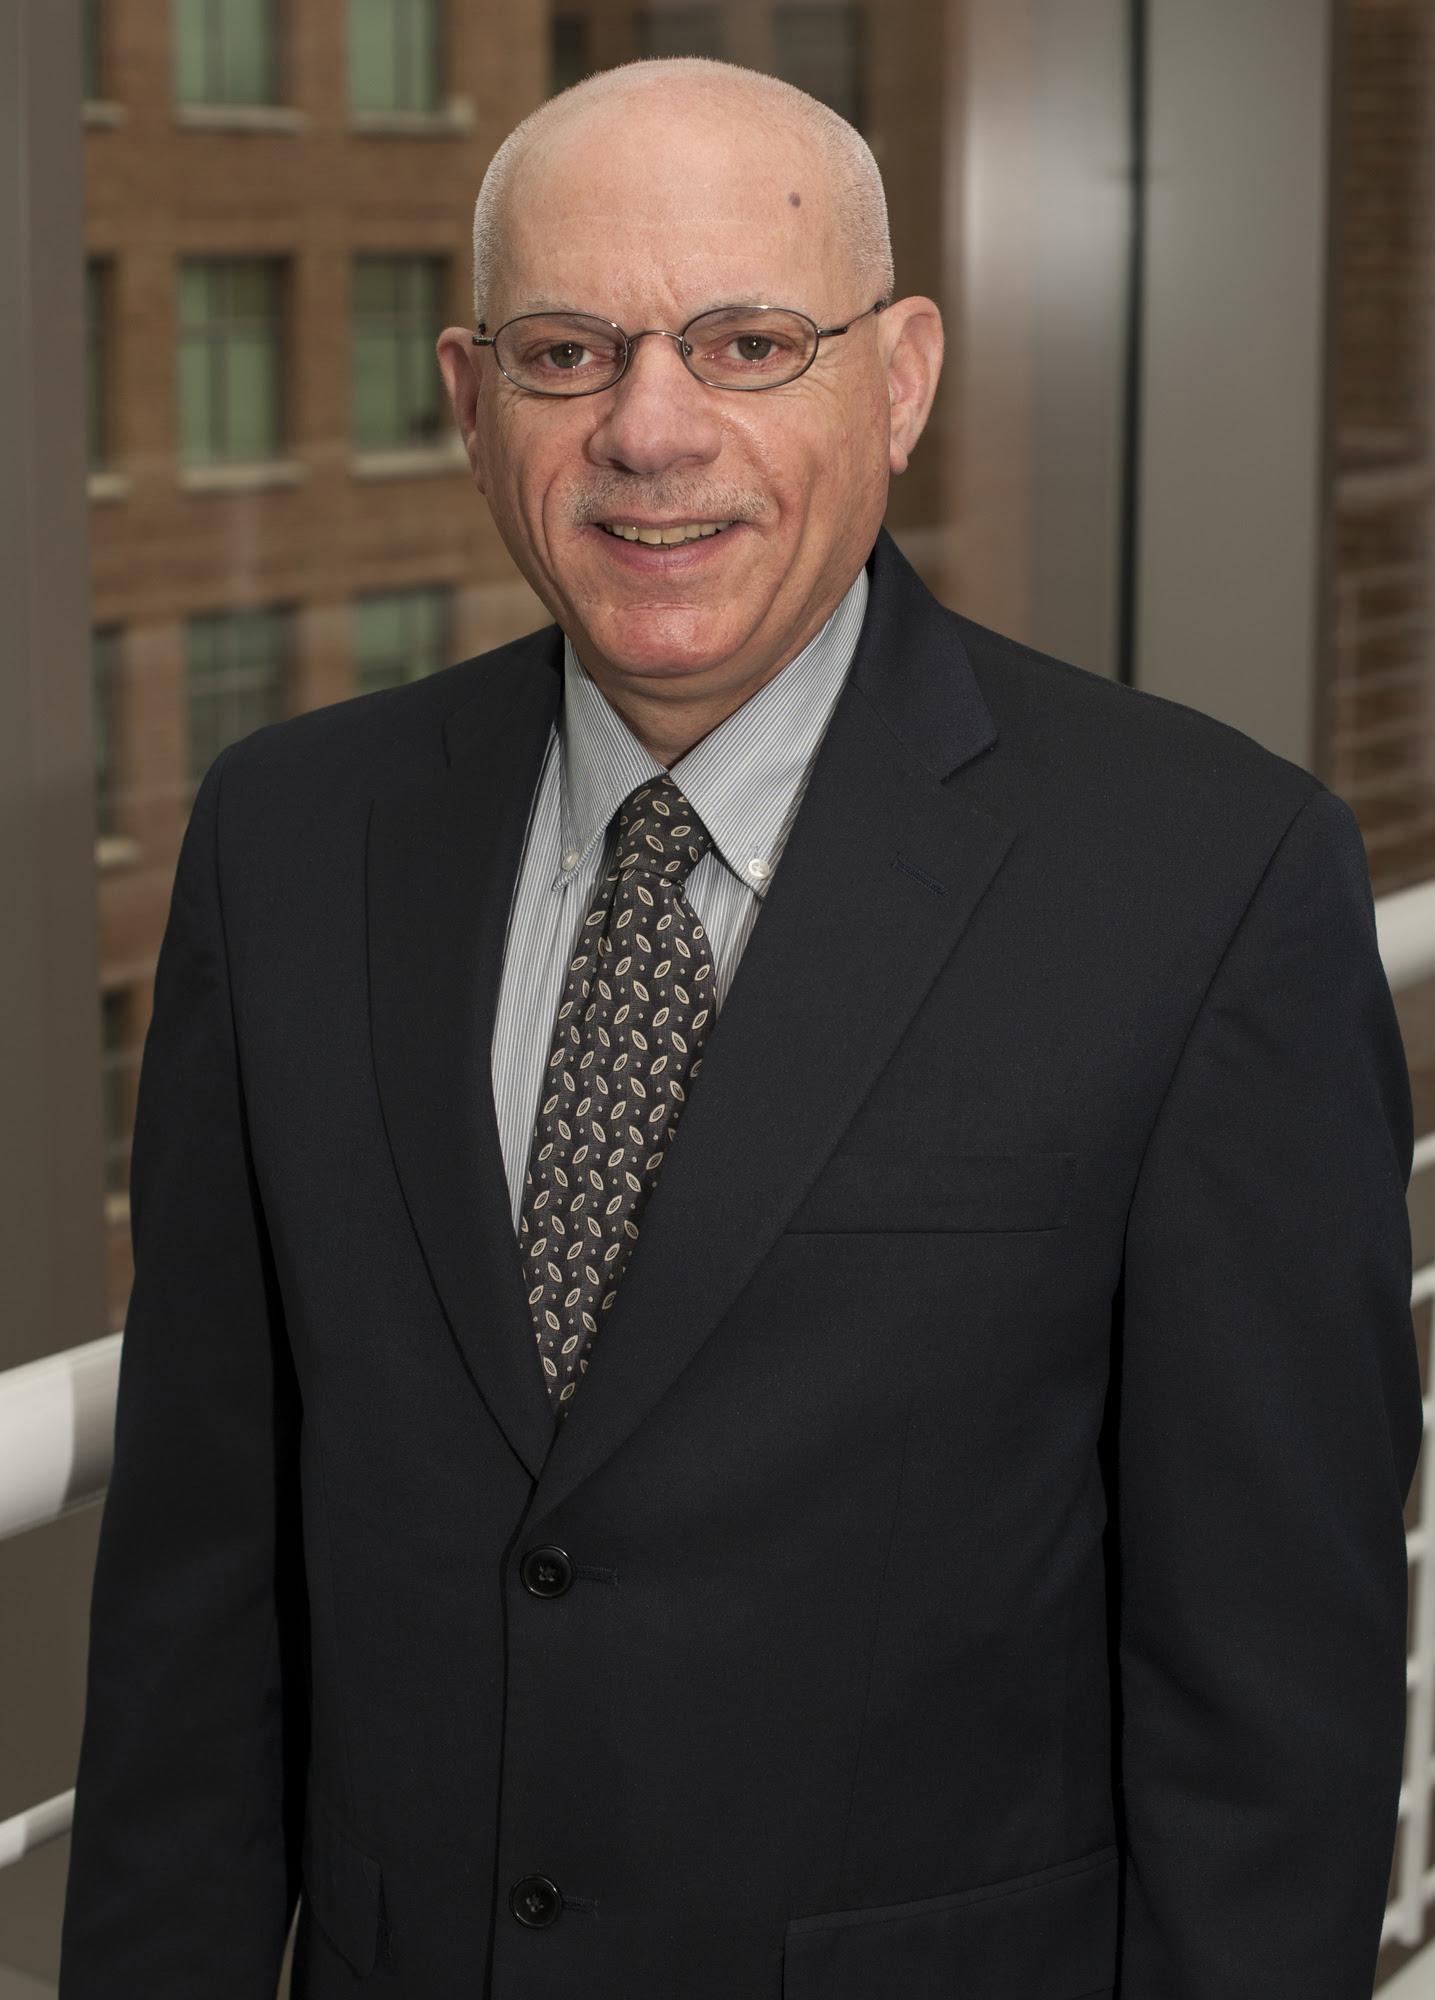 Dr. Stephen Ostroff